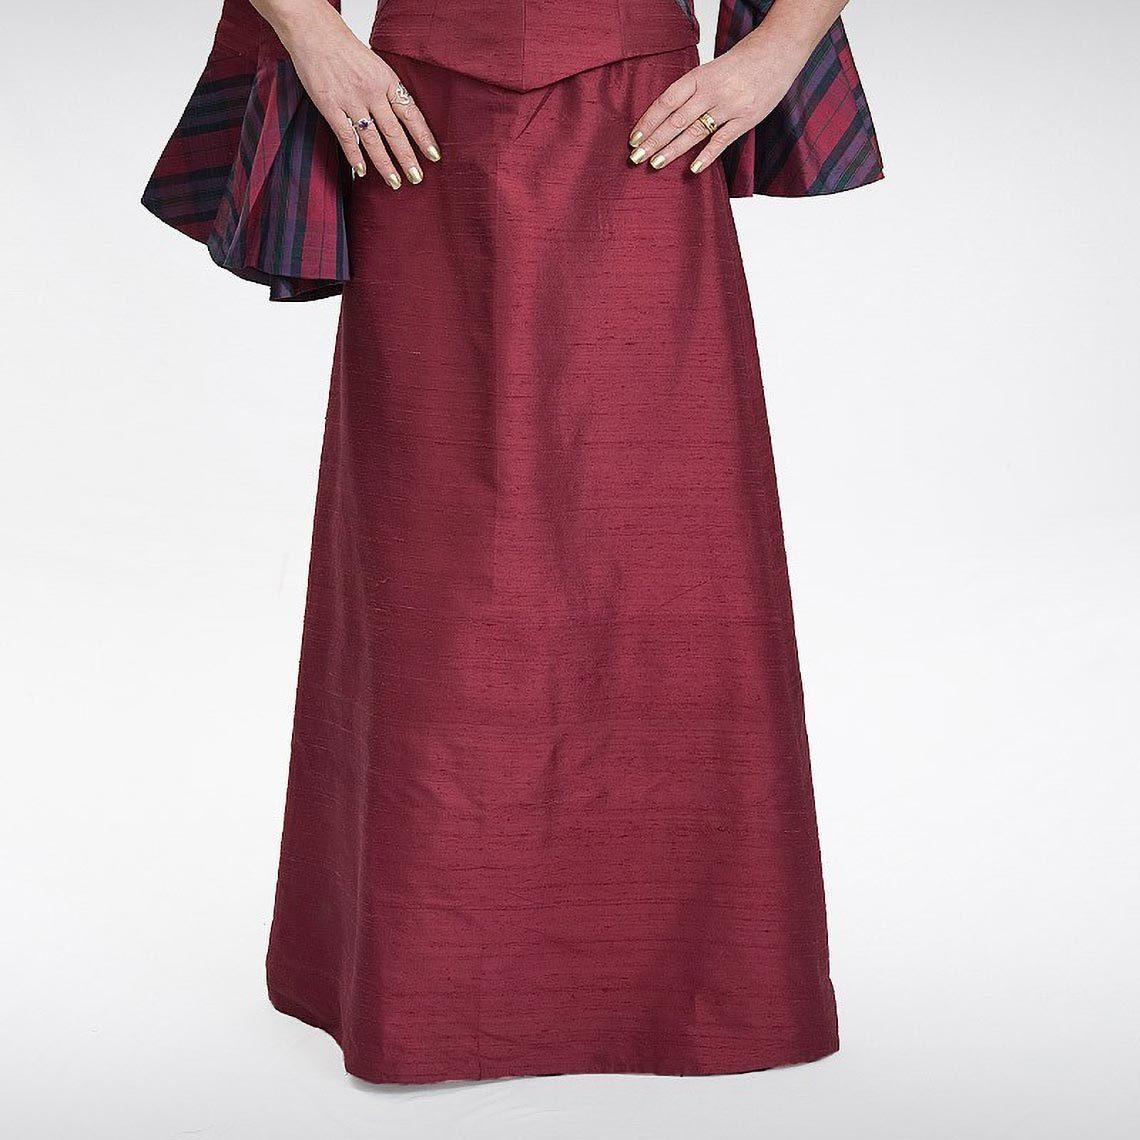 Wine A-Line Skirt